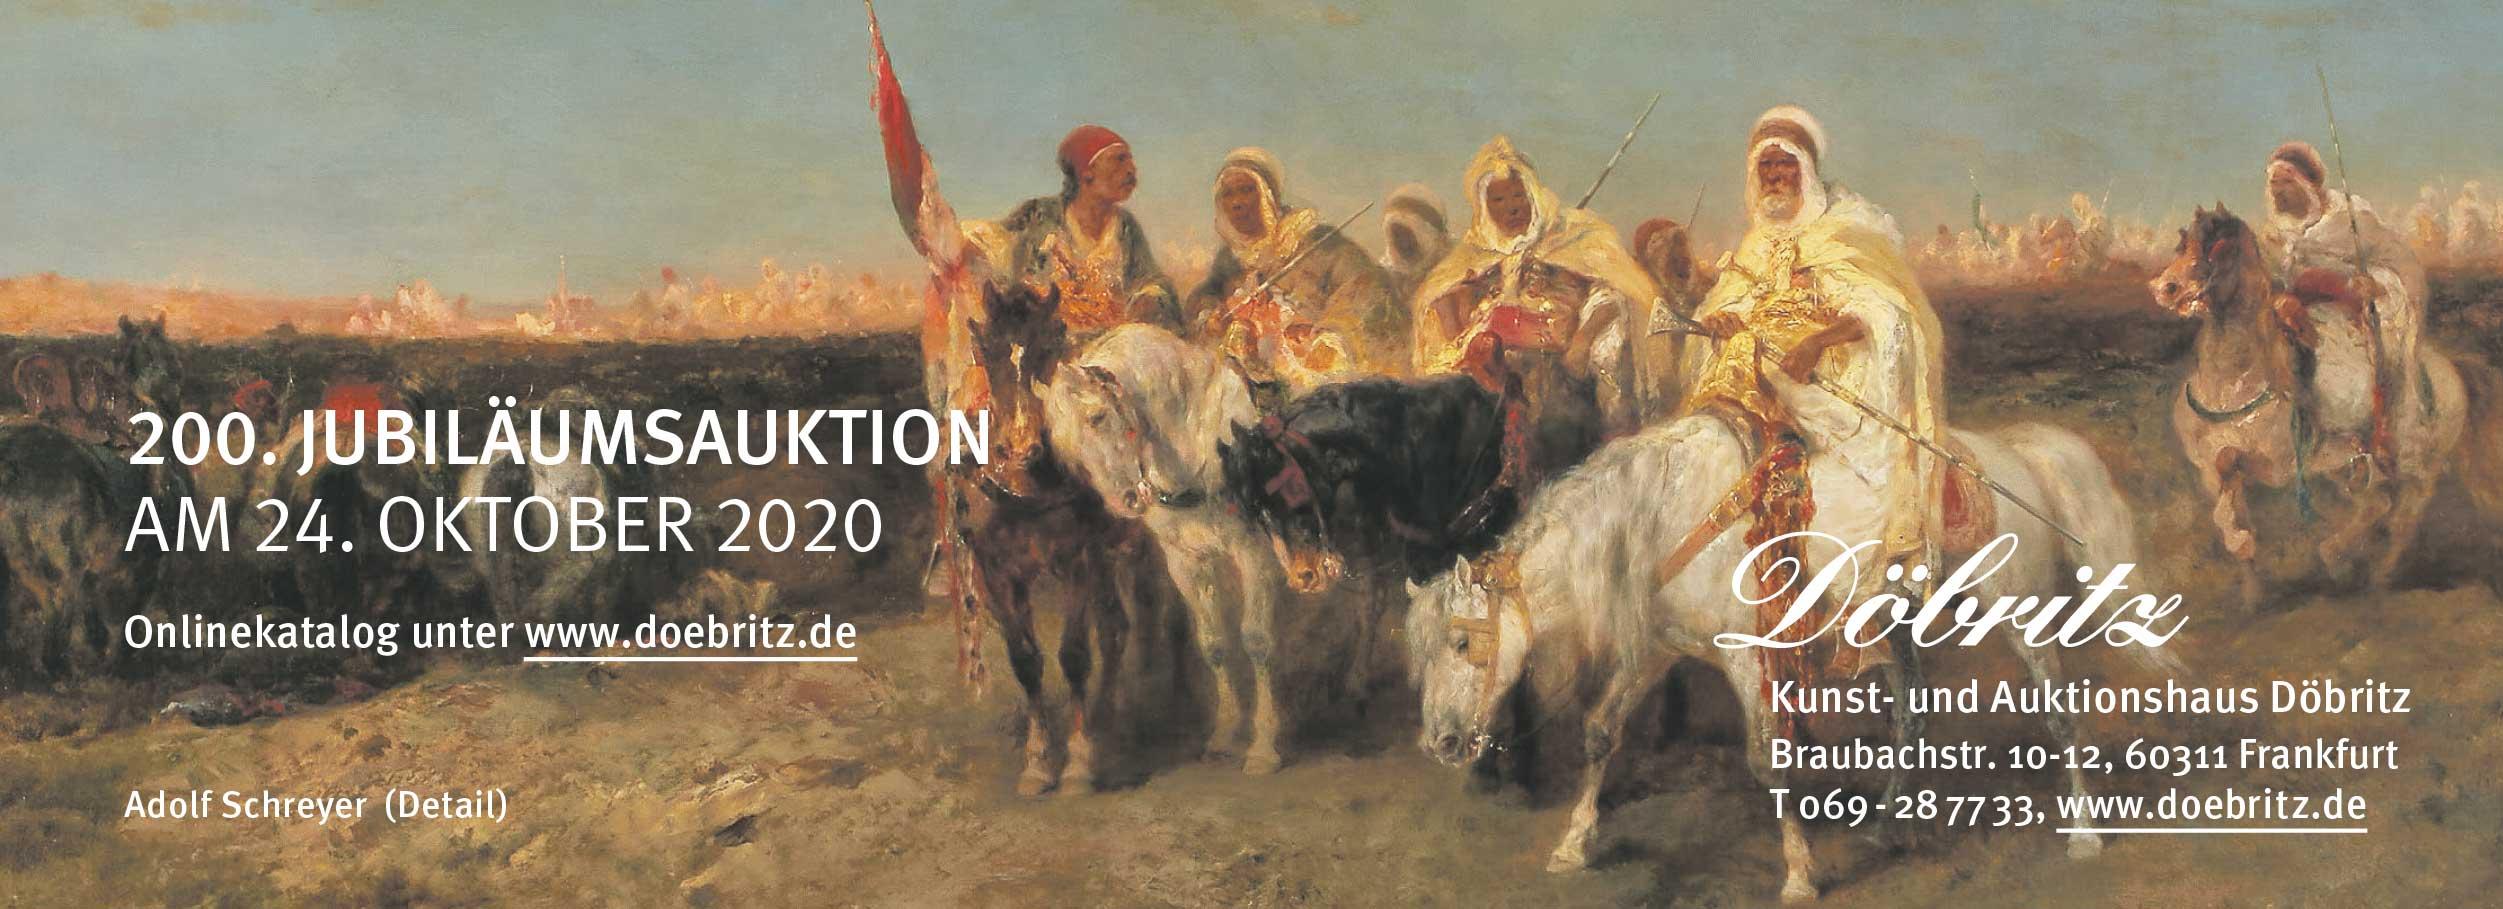 200. Jubiläumsauktion